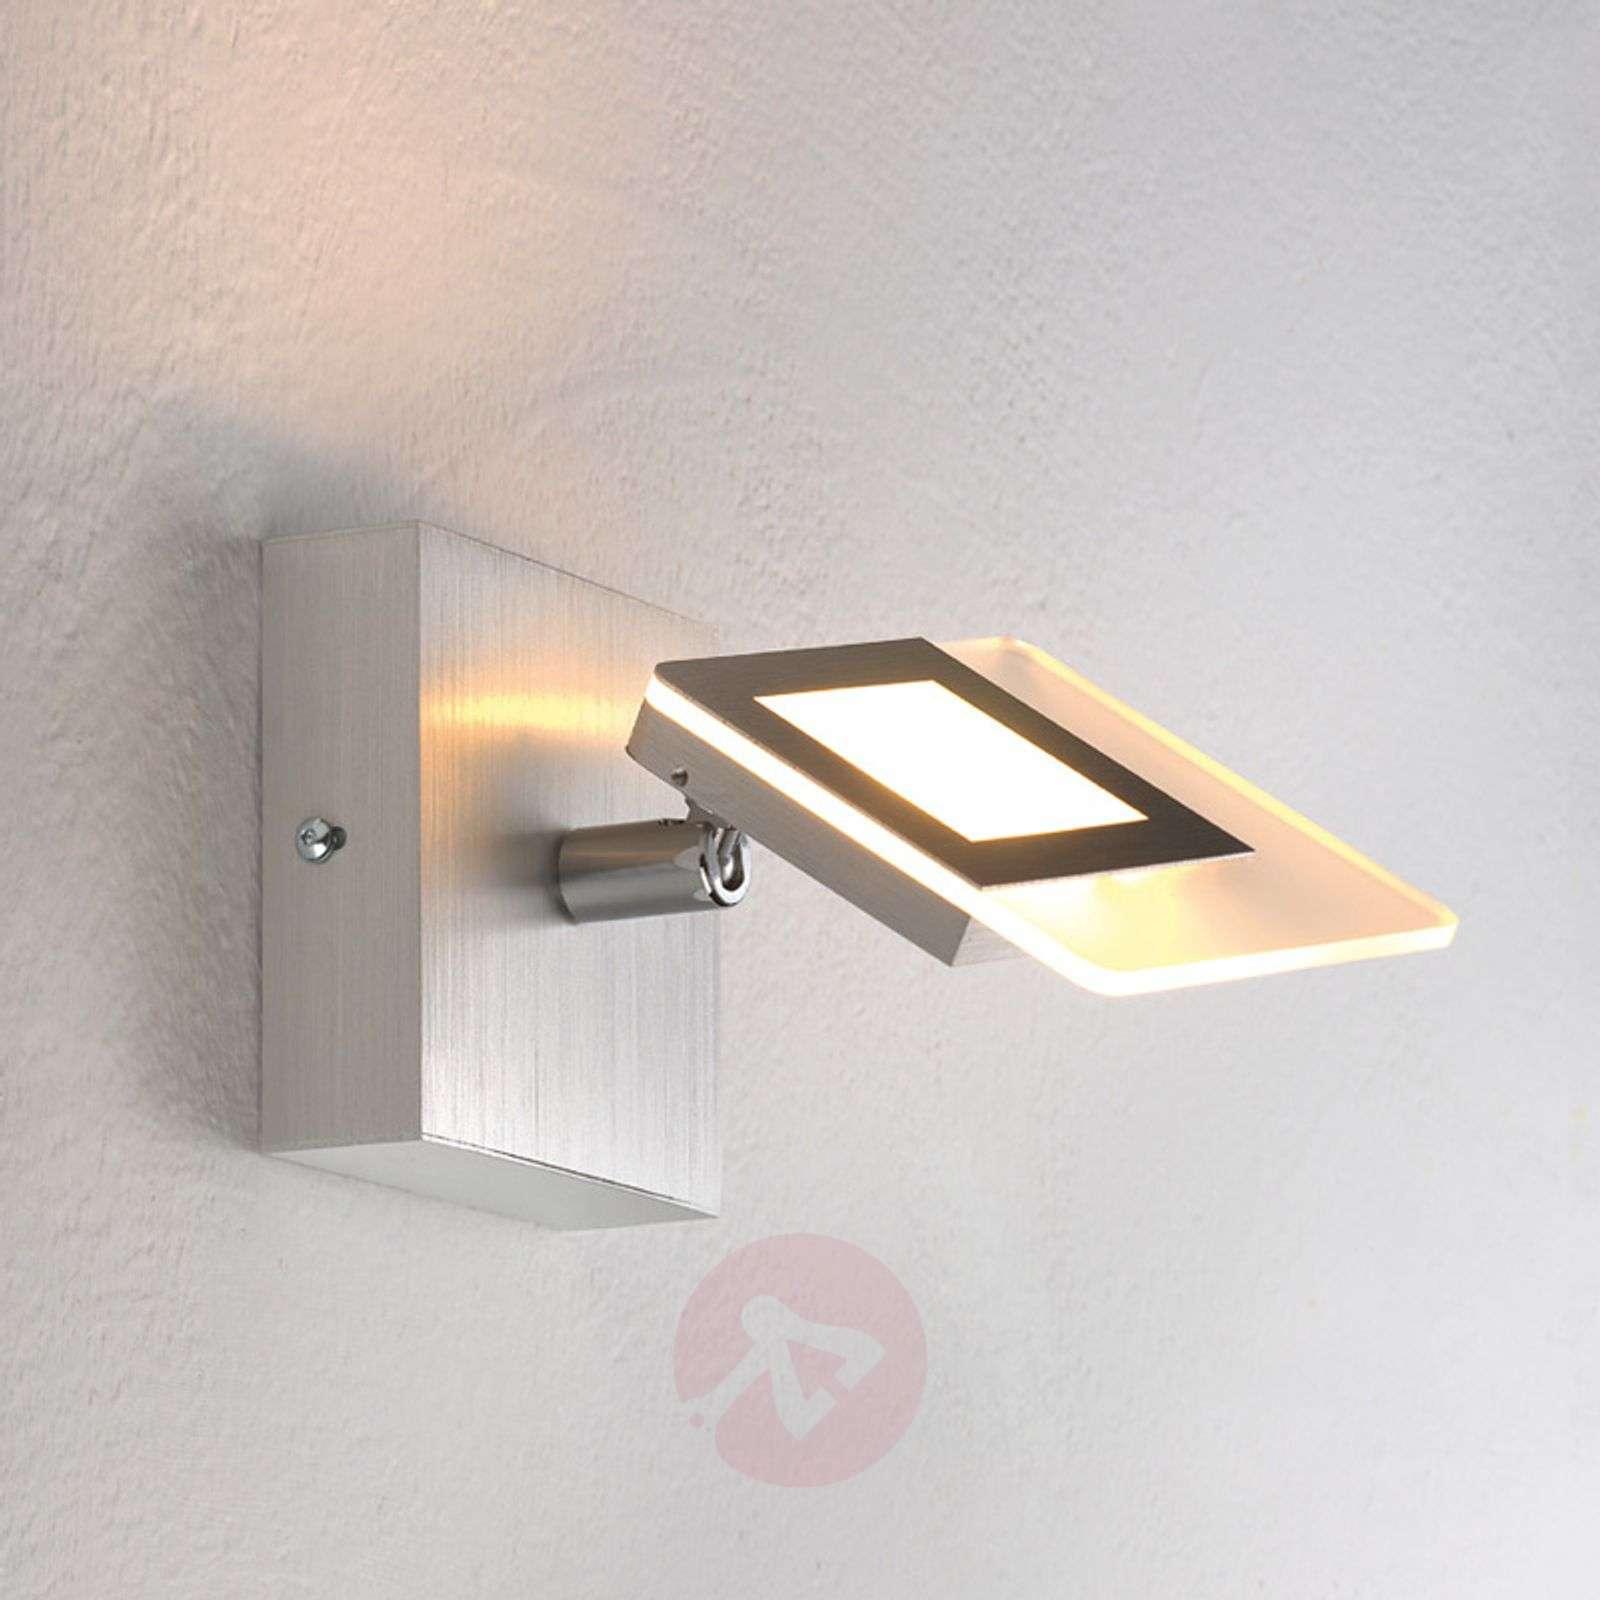 Moderni LED-seinäspotti Line-1556044-01